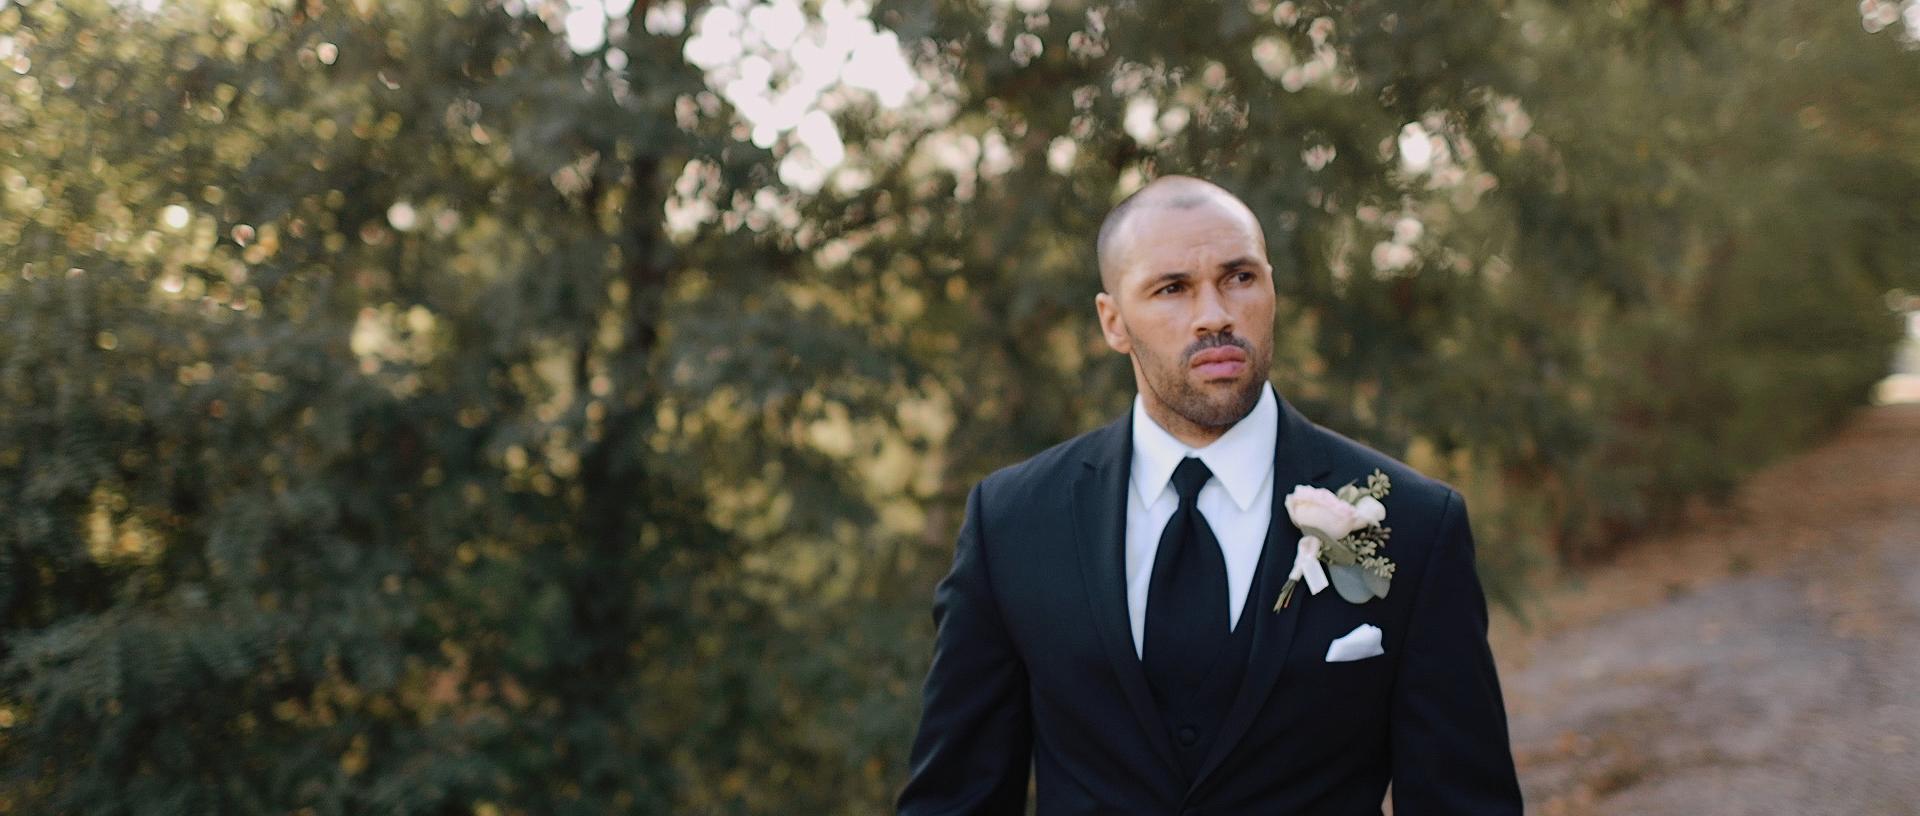 wichita-kansas-wedding-video-groom